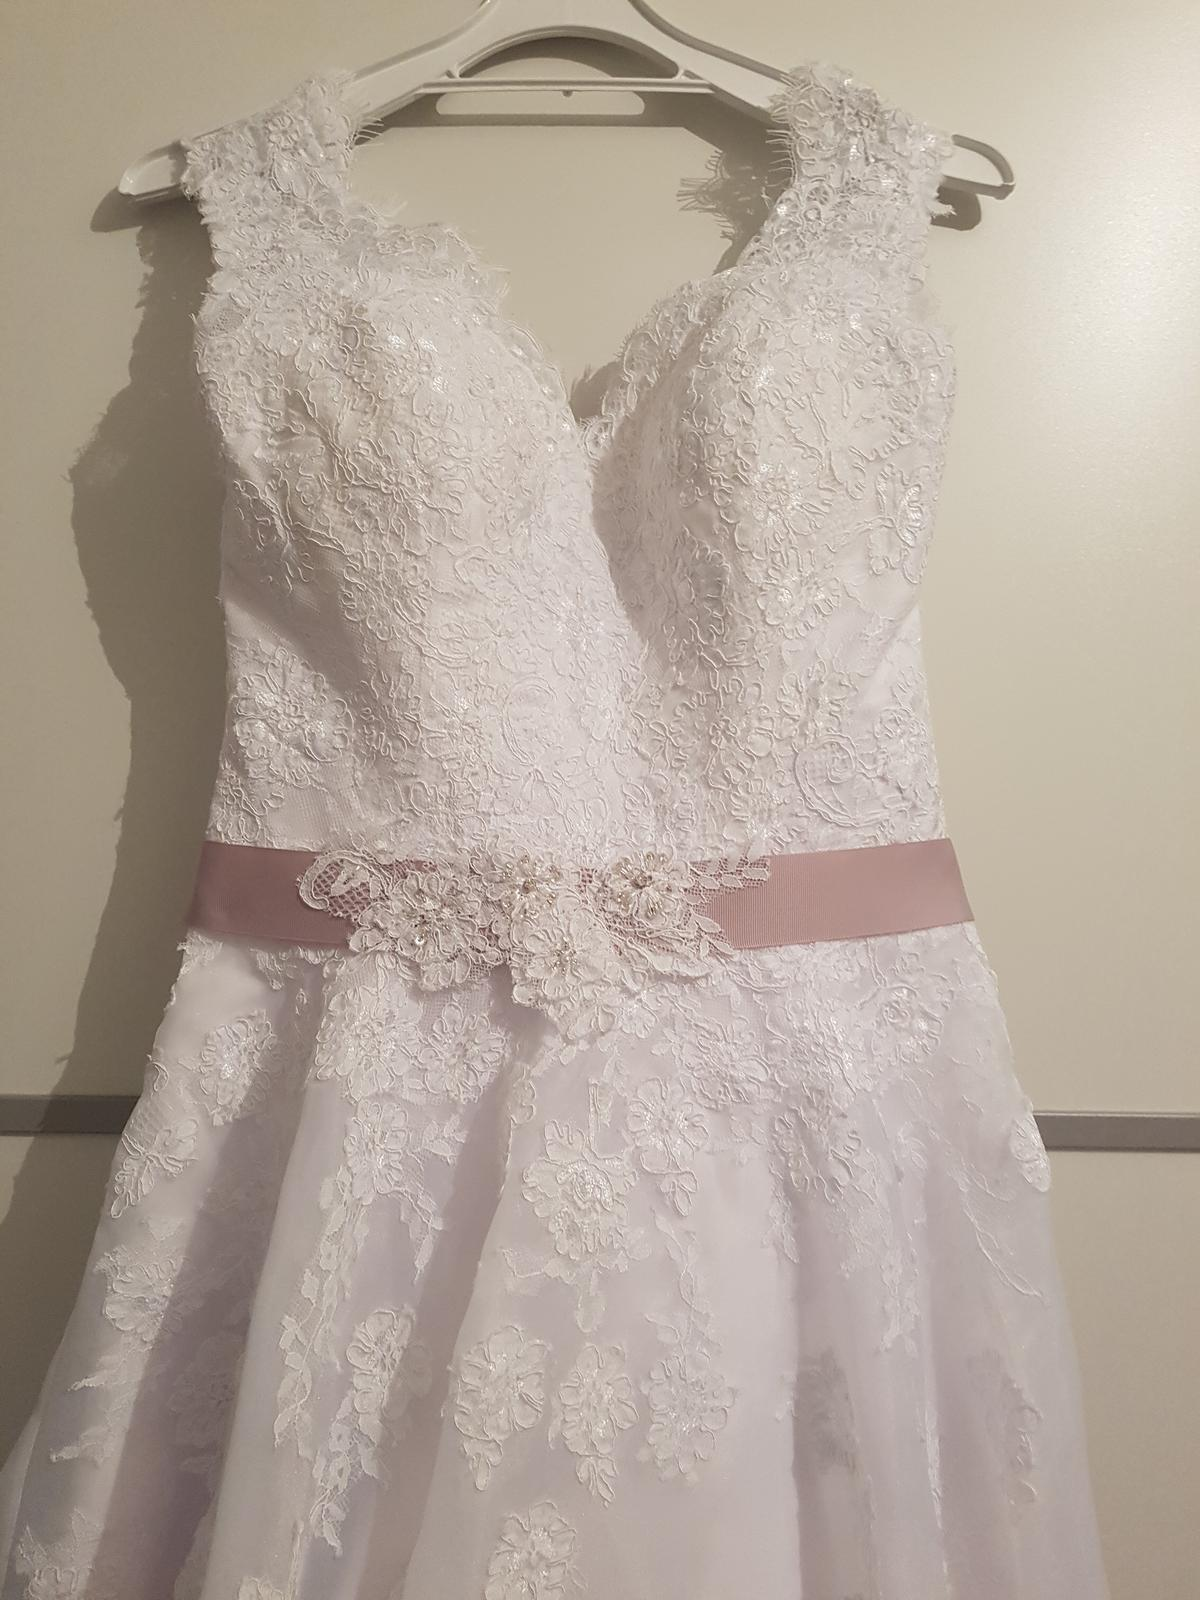 Svadobné šaty Cocomelody - Obrázok č. 4